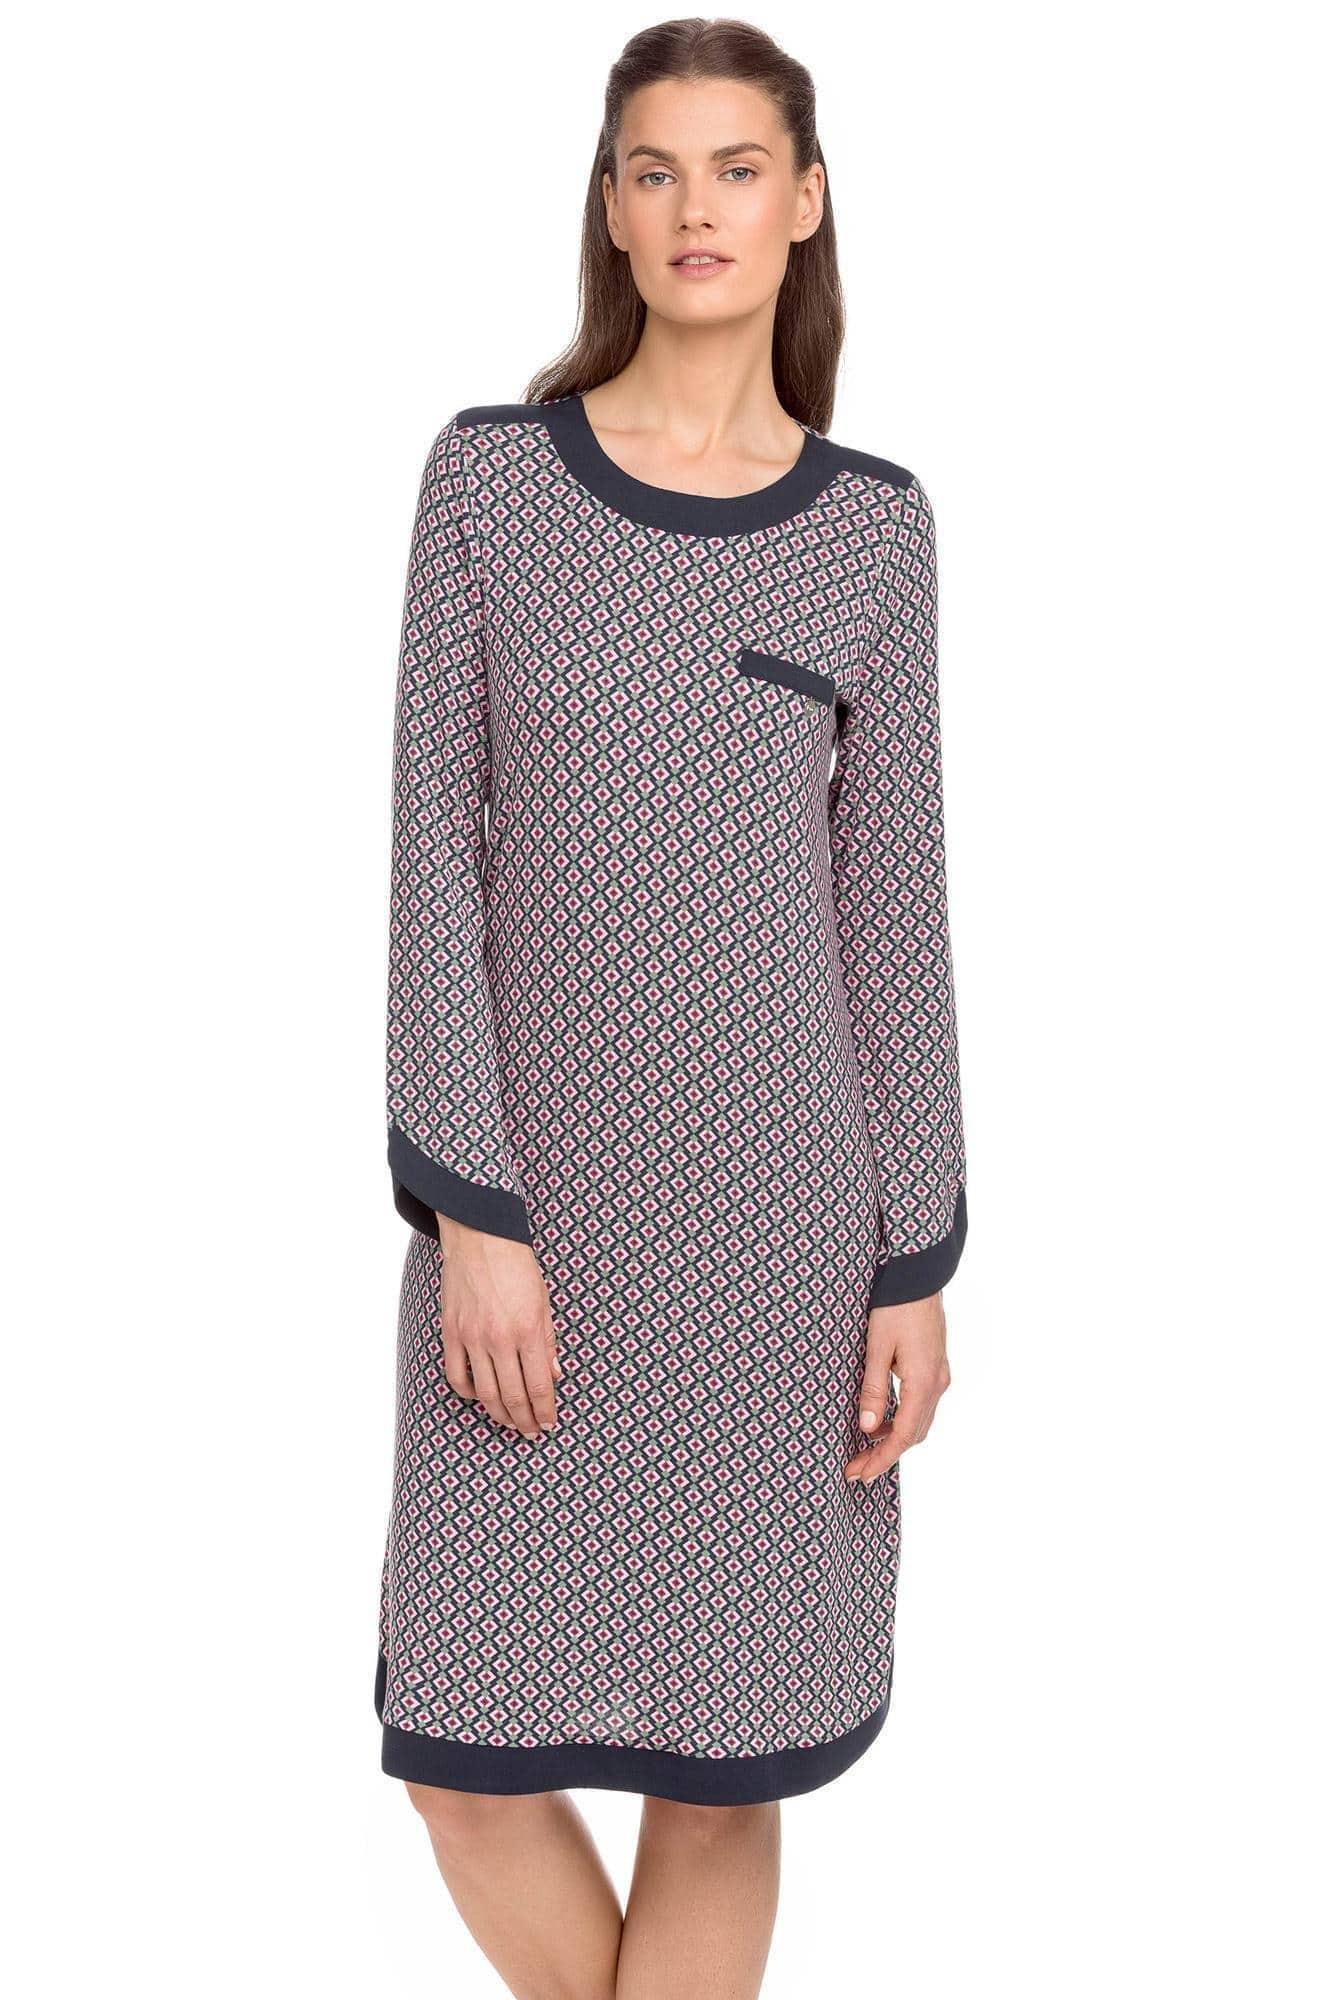 Women's comfort fit nightgown